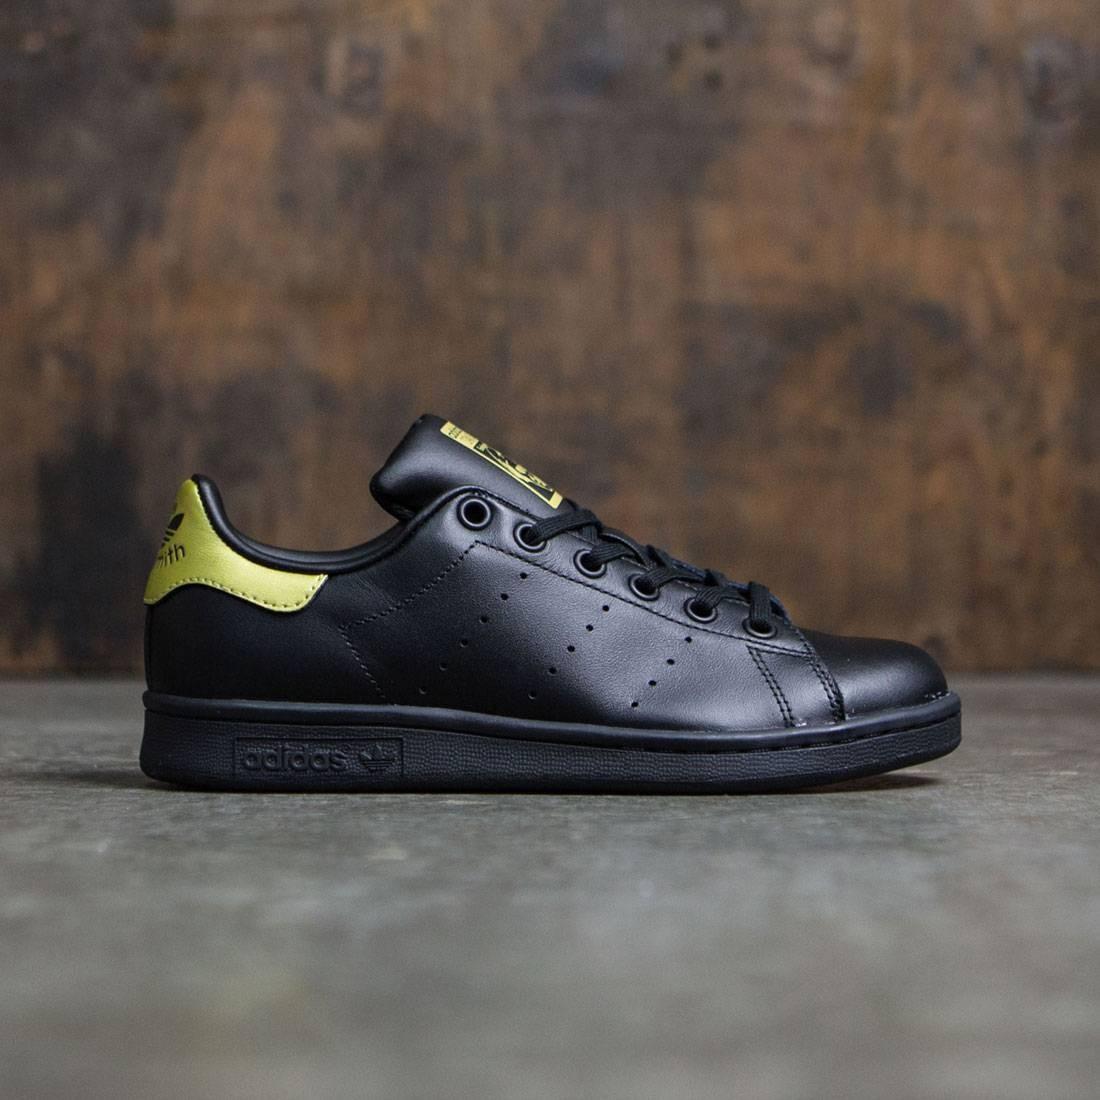 Adidas Big Kids Stan Smith black core black gold metallic 6eb54f2d1